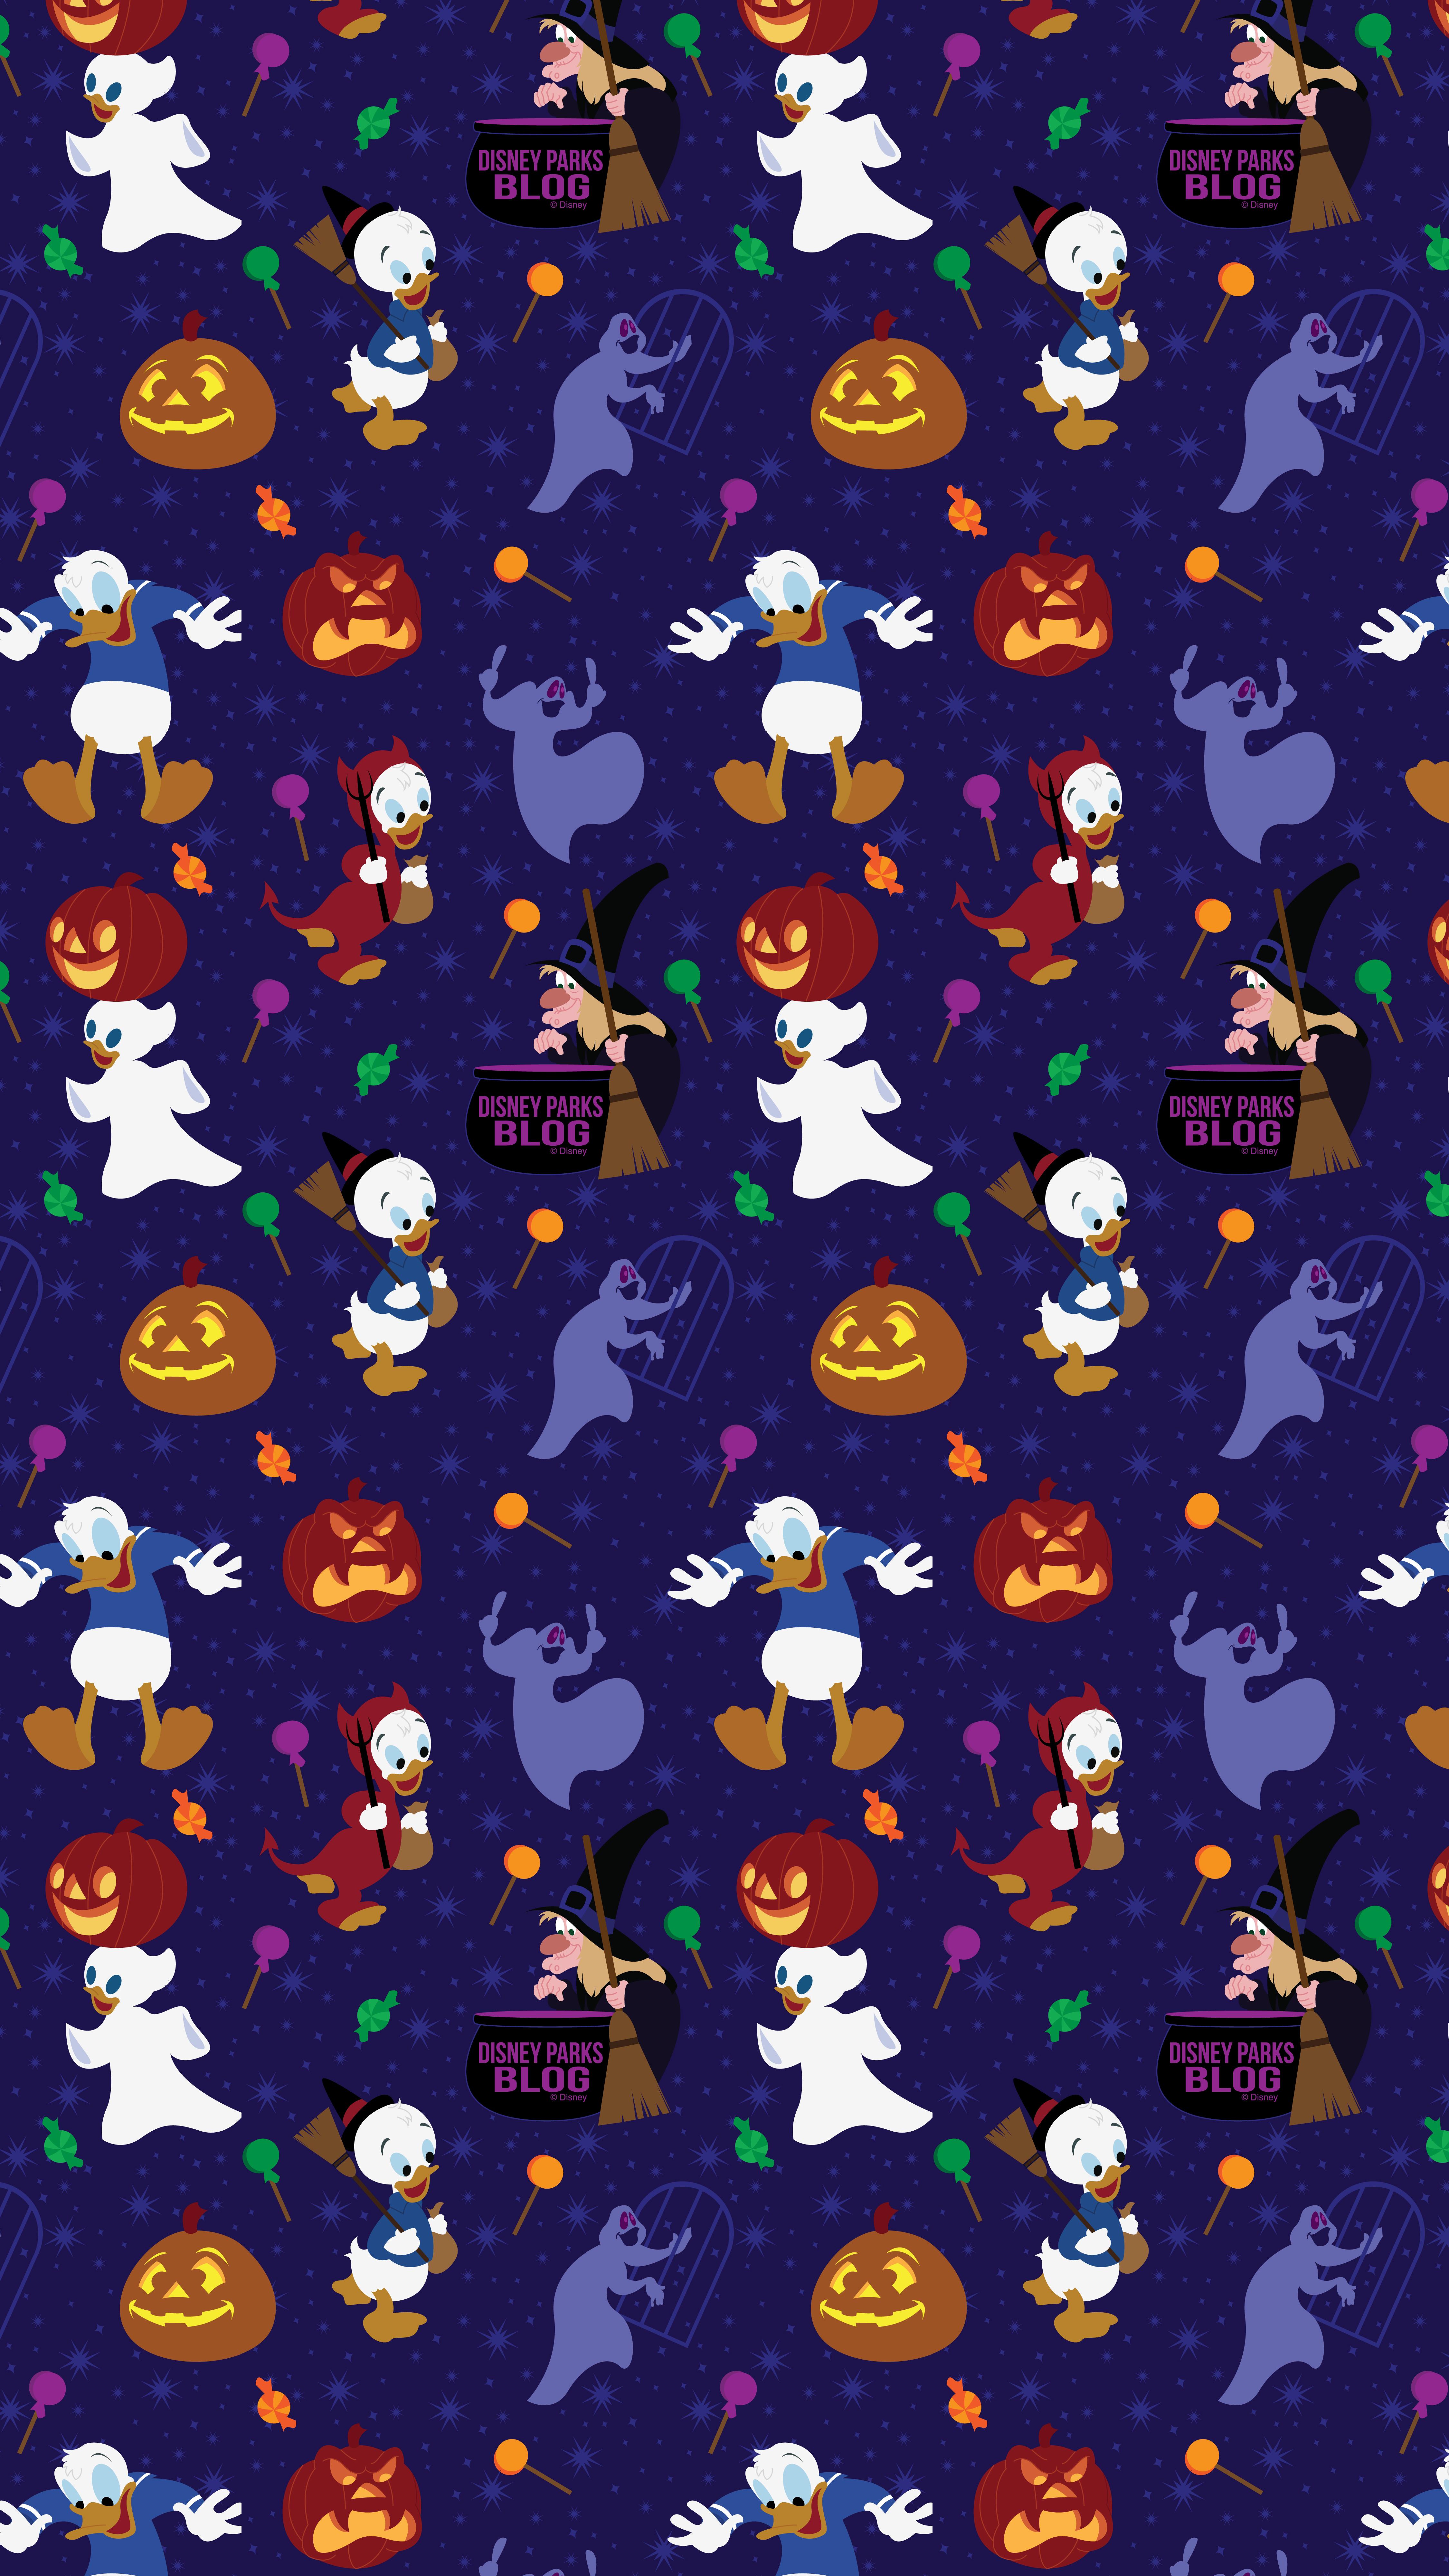 Disney Halloween Wallpaper Iphone 4500x8000 Wallpaper Teahub Io